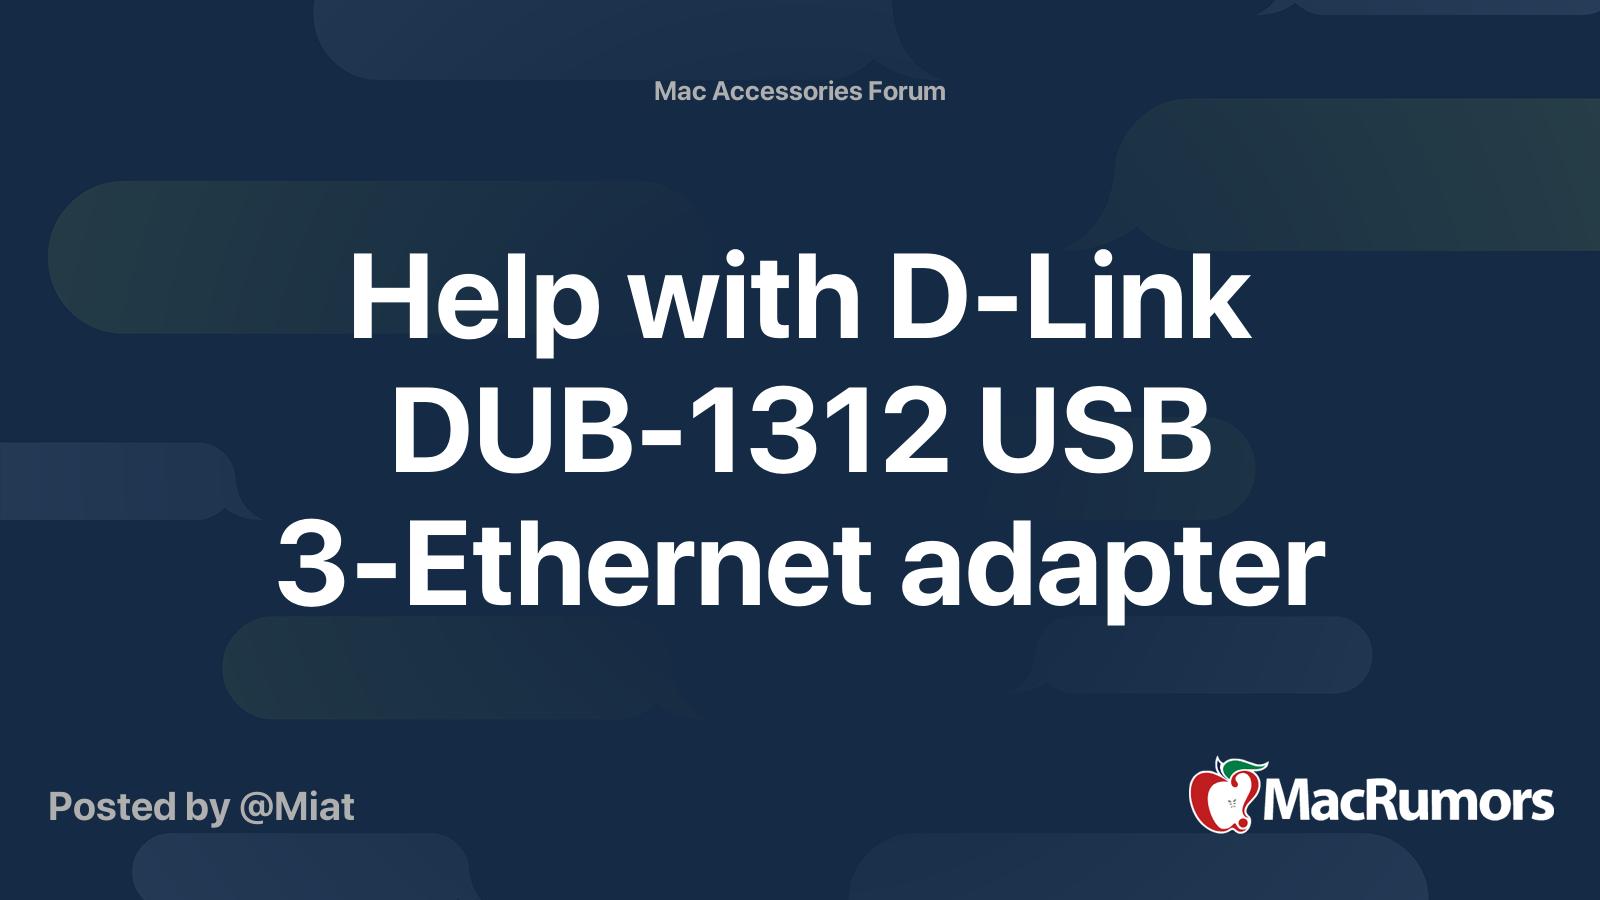 D link dub 1312 driver for mac windows 7